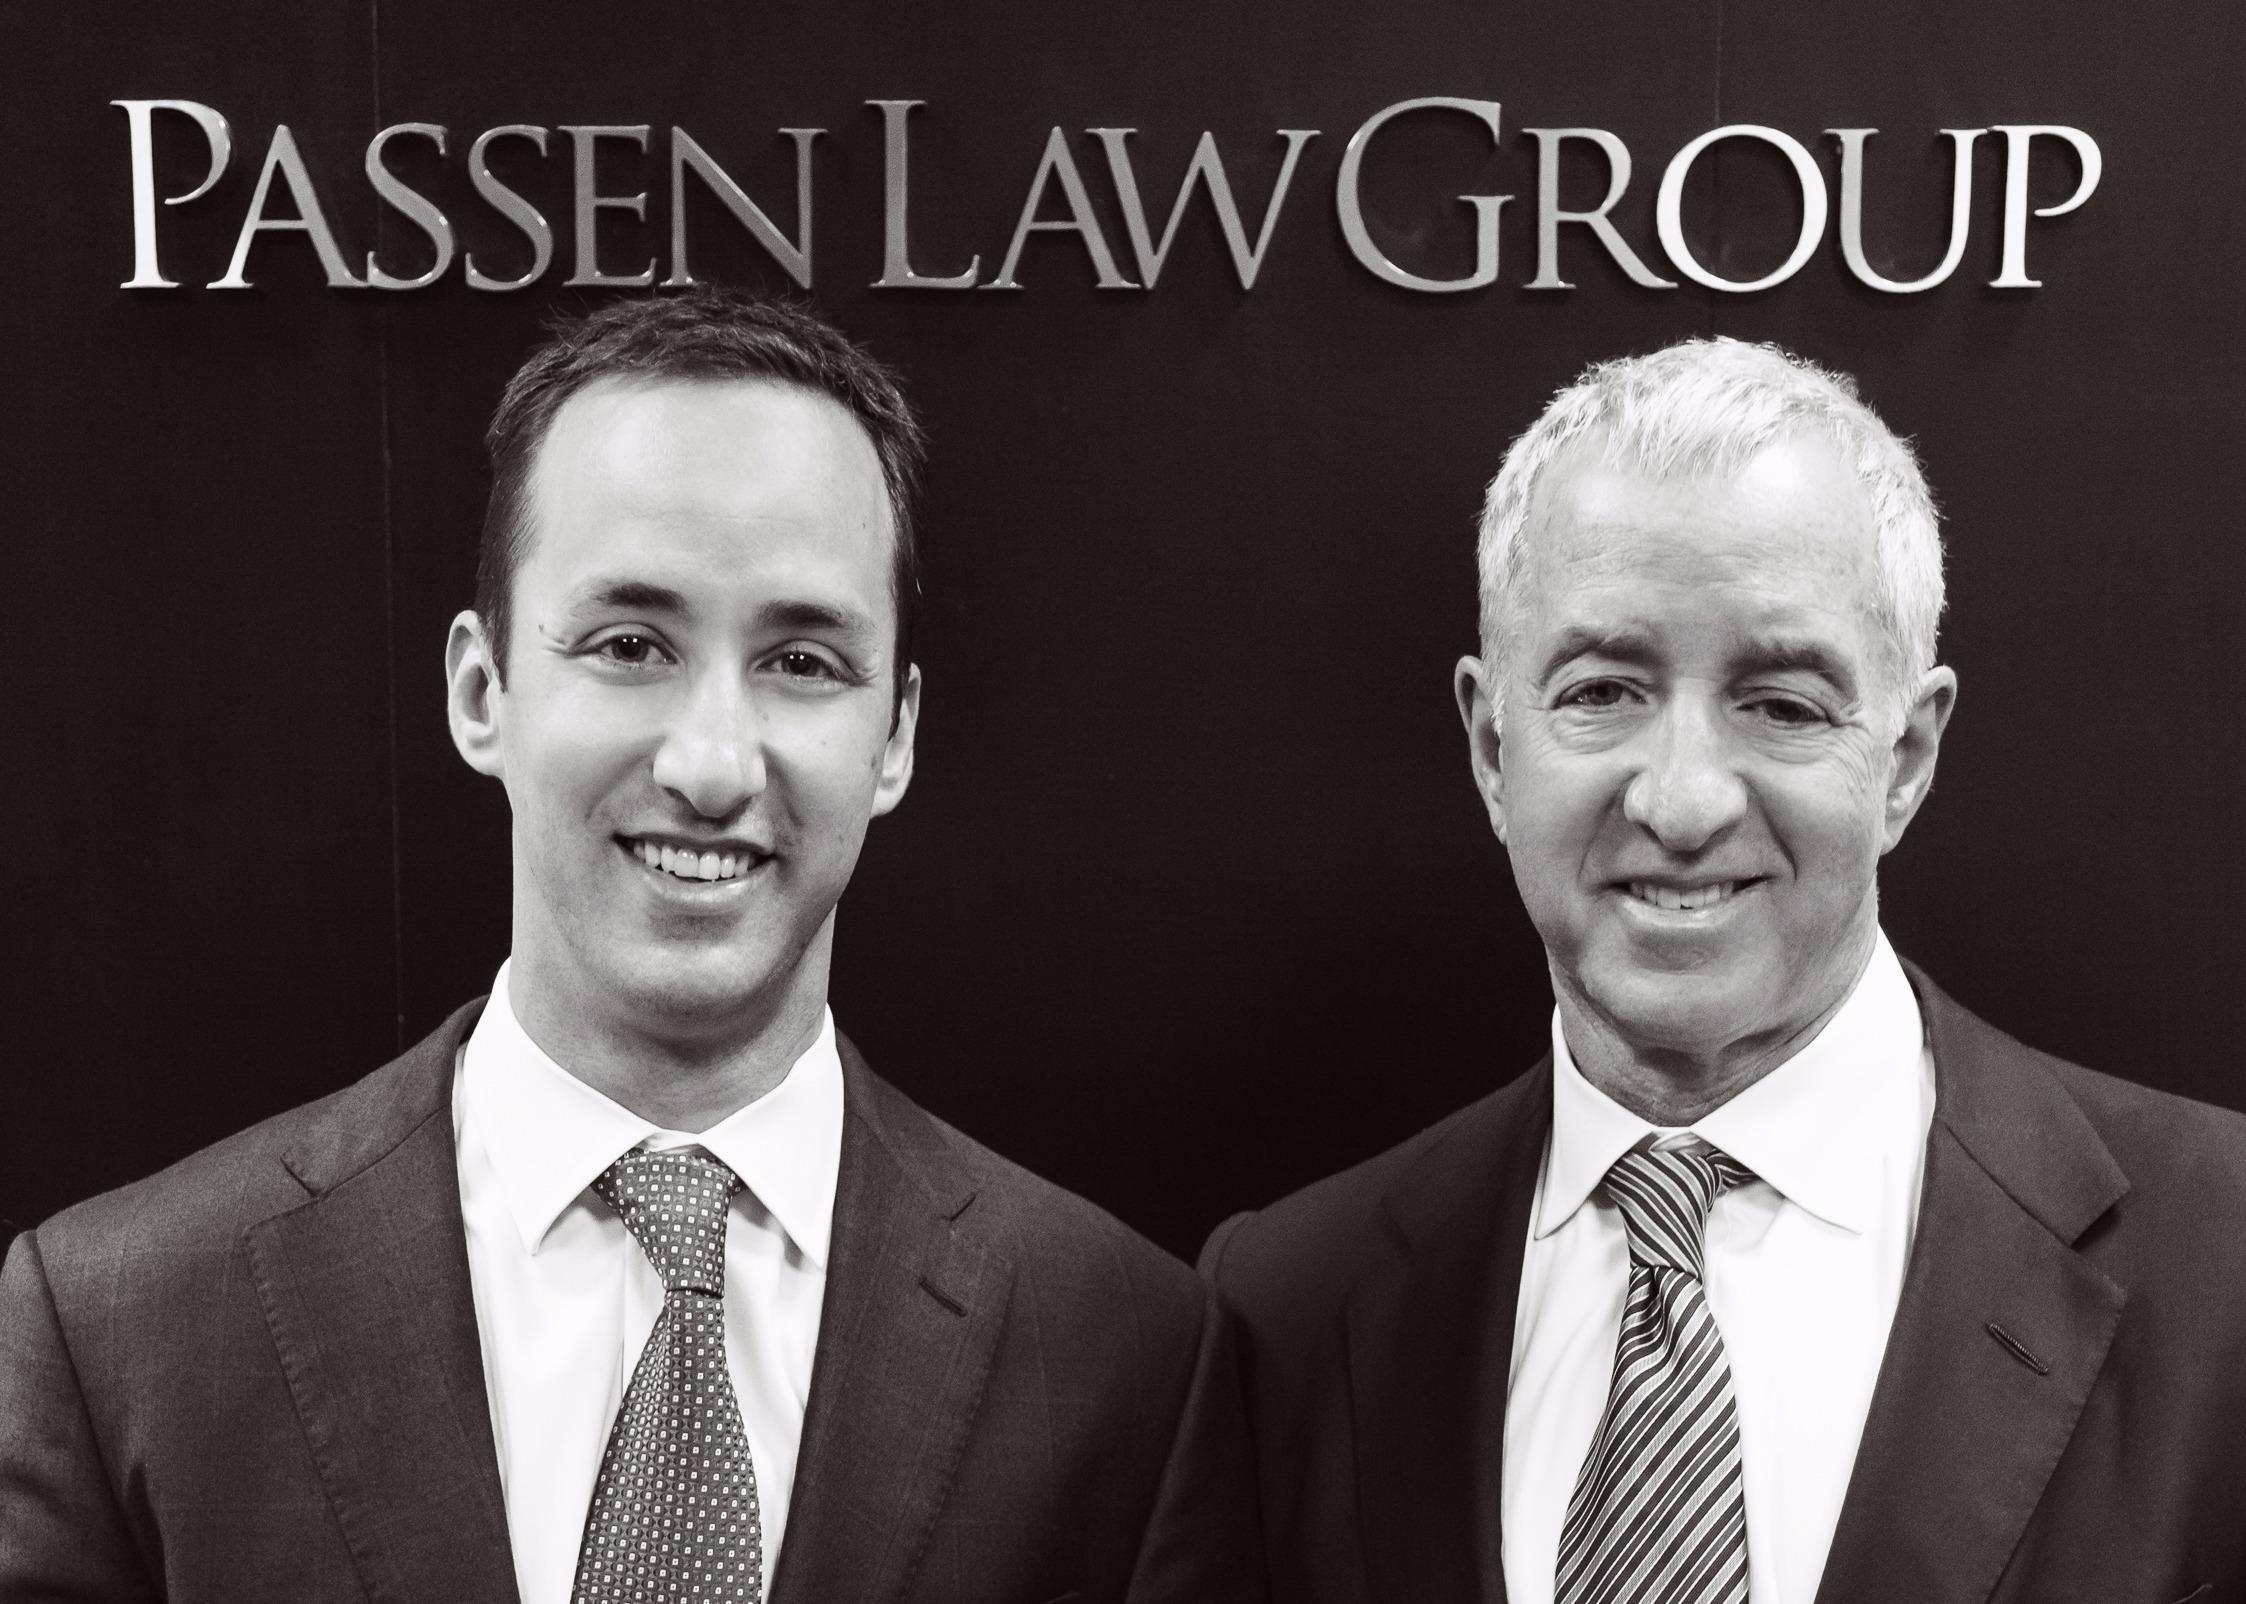 Passen Law Group image 4